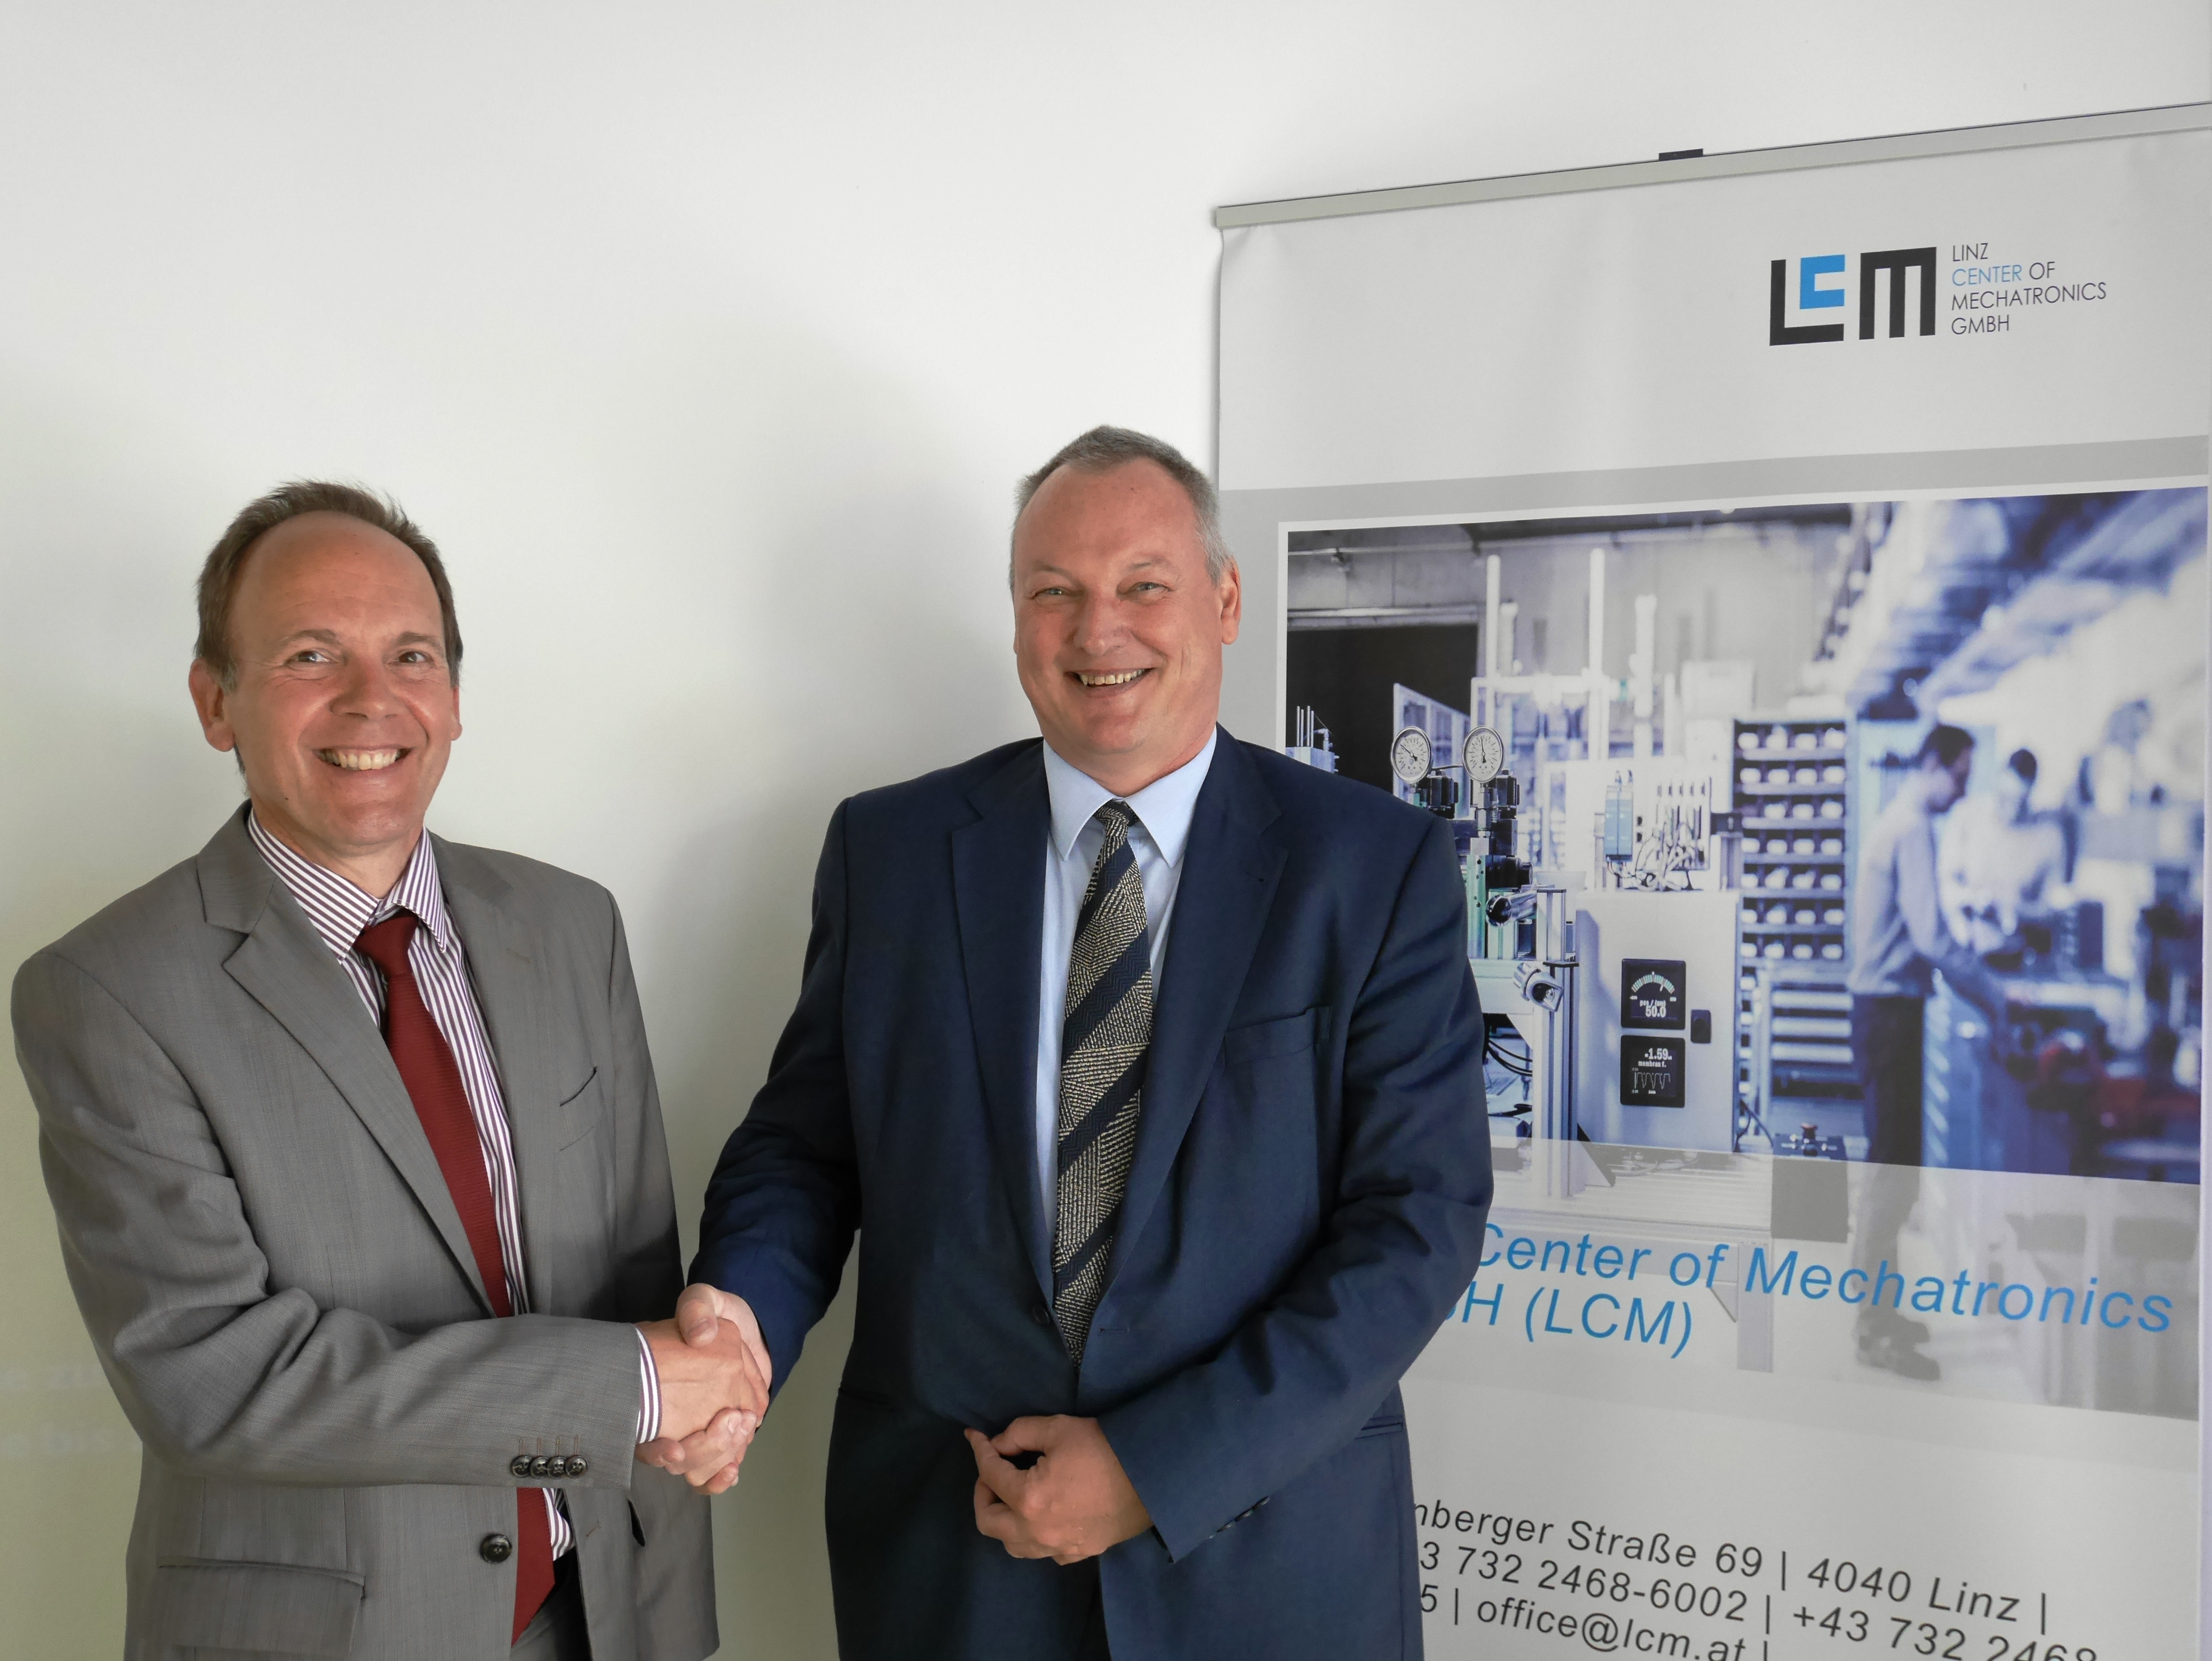 Belgian embassy visited the Linz Center of Mechatronics GmbH